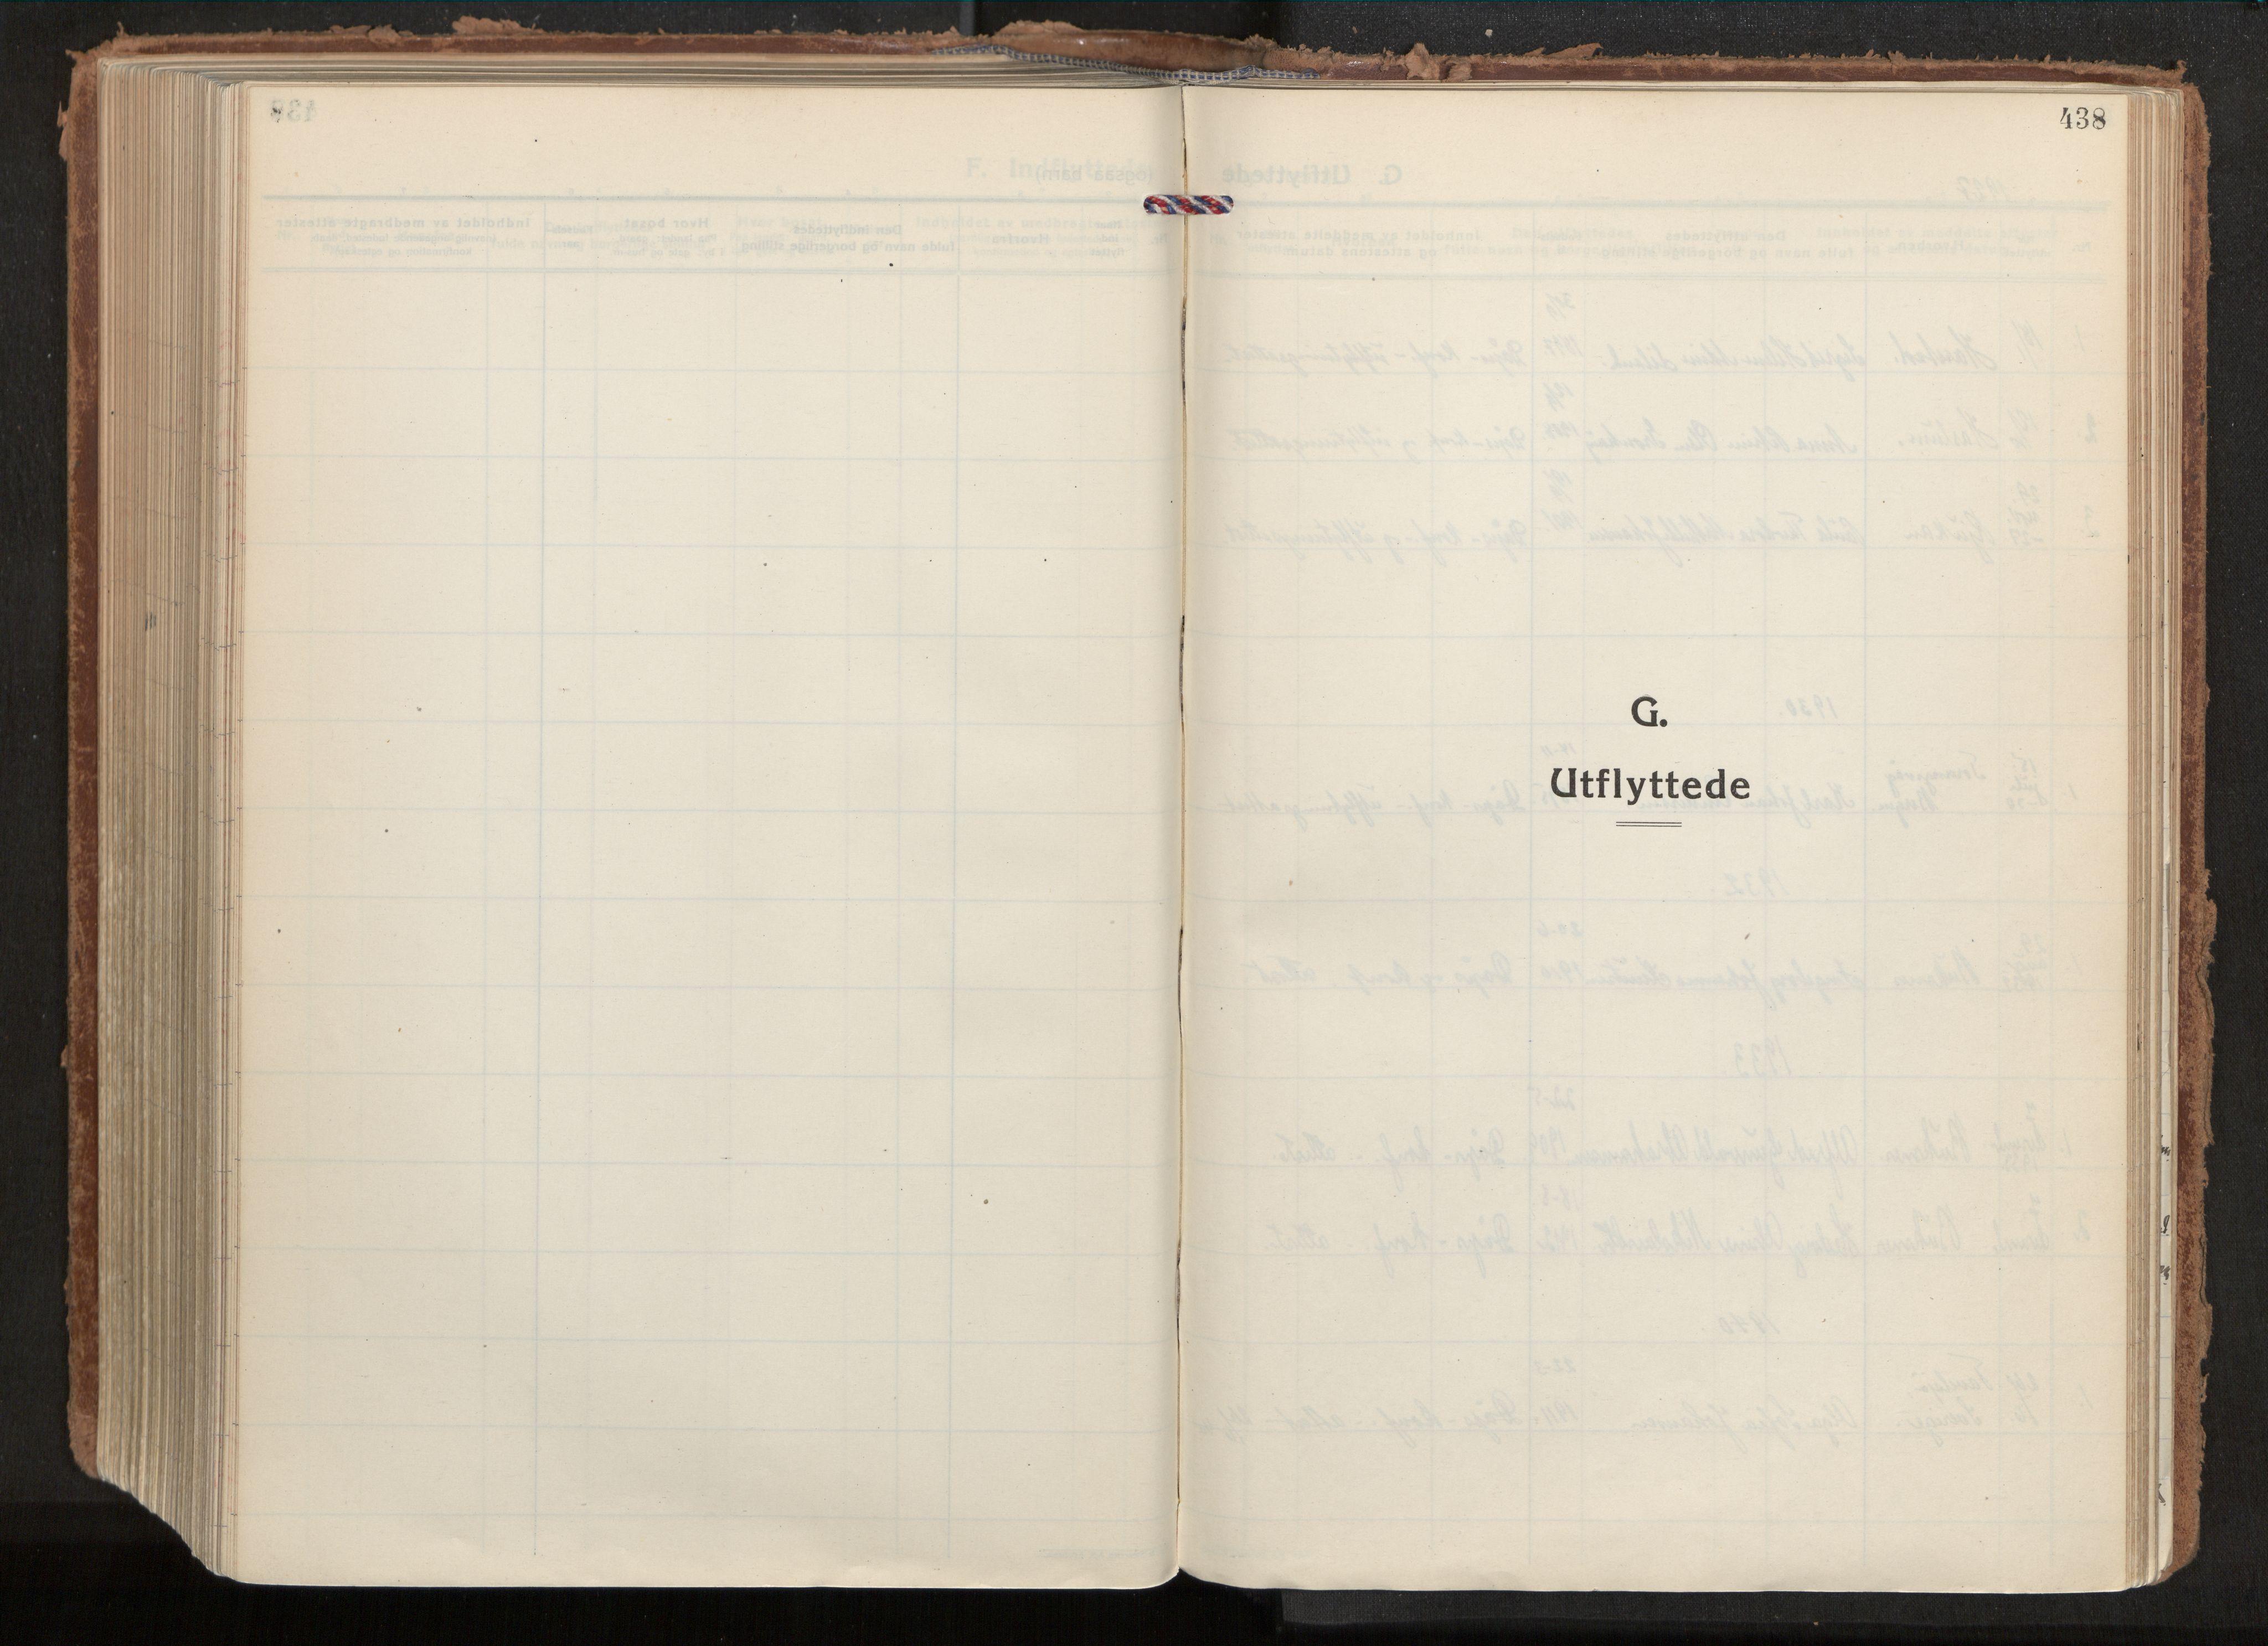 SAT, Ministerialprotokoller, klokkerbøker og fødselsregistre - Nordland, 880/L1137: Ministerialbok nr. 880A11, 1927-1944, s. 438